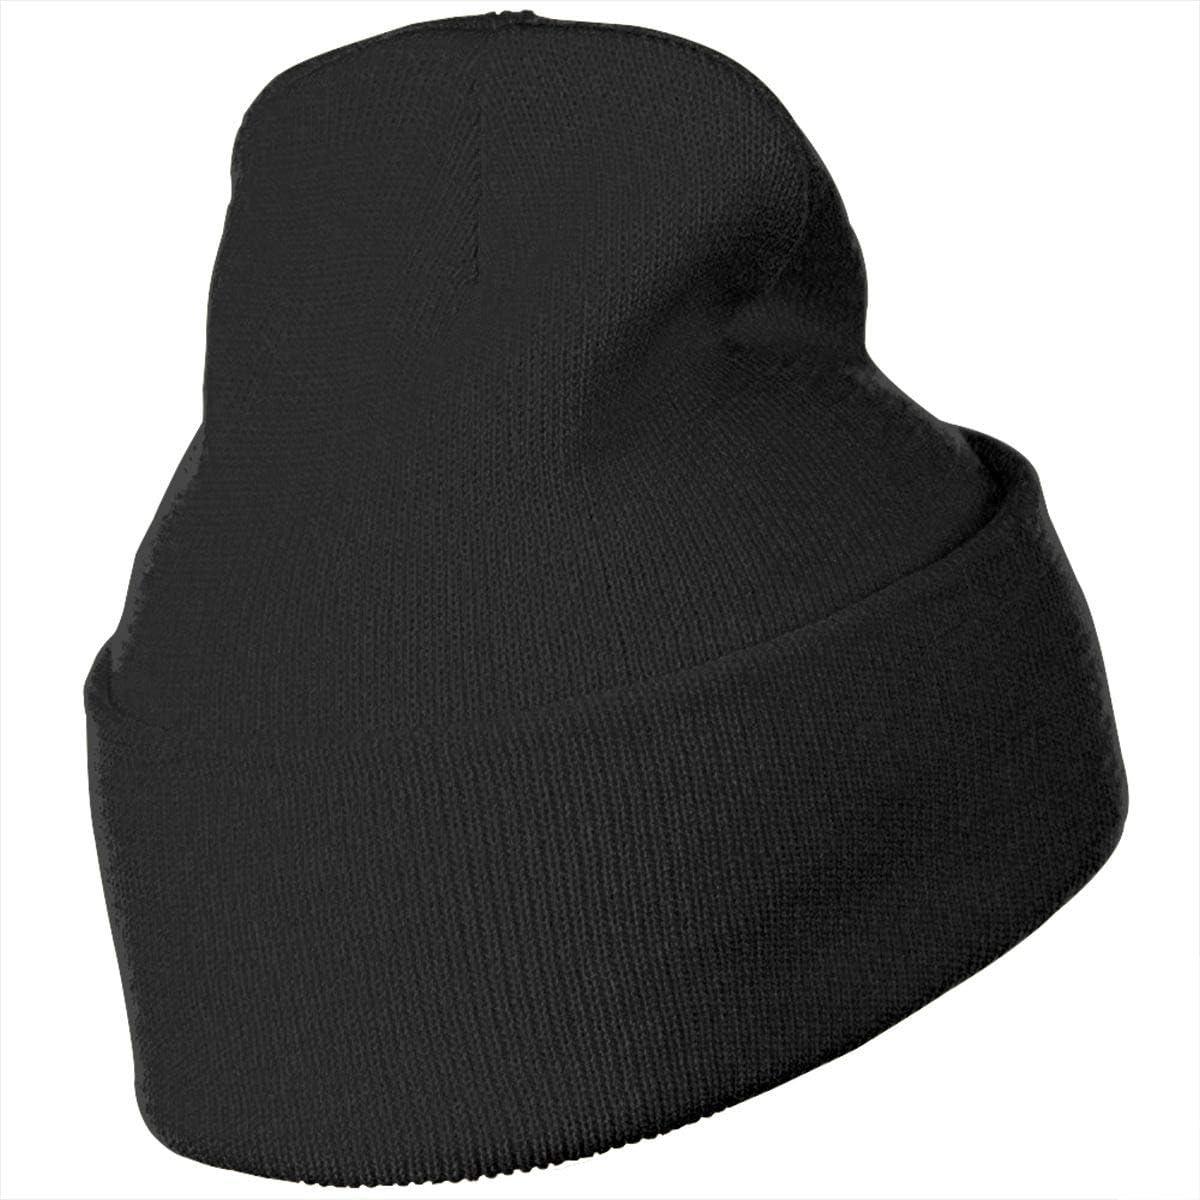 Yubb7E Bats Warm Knit Winter Solid Beanie Hat Unisex Skull Cap